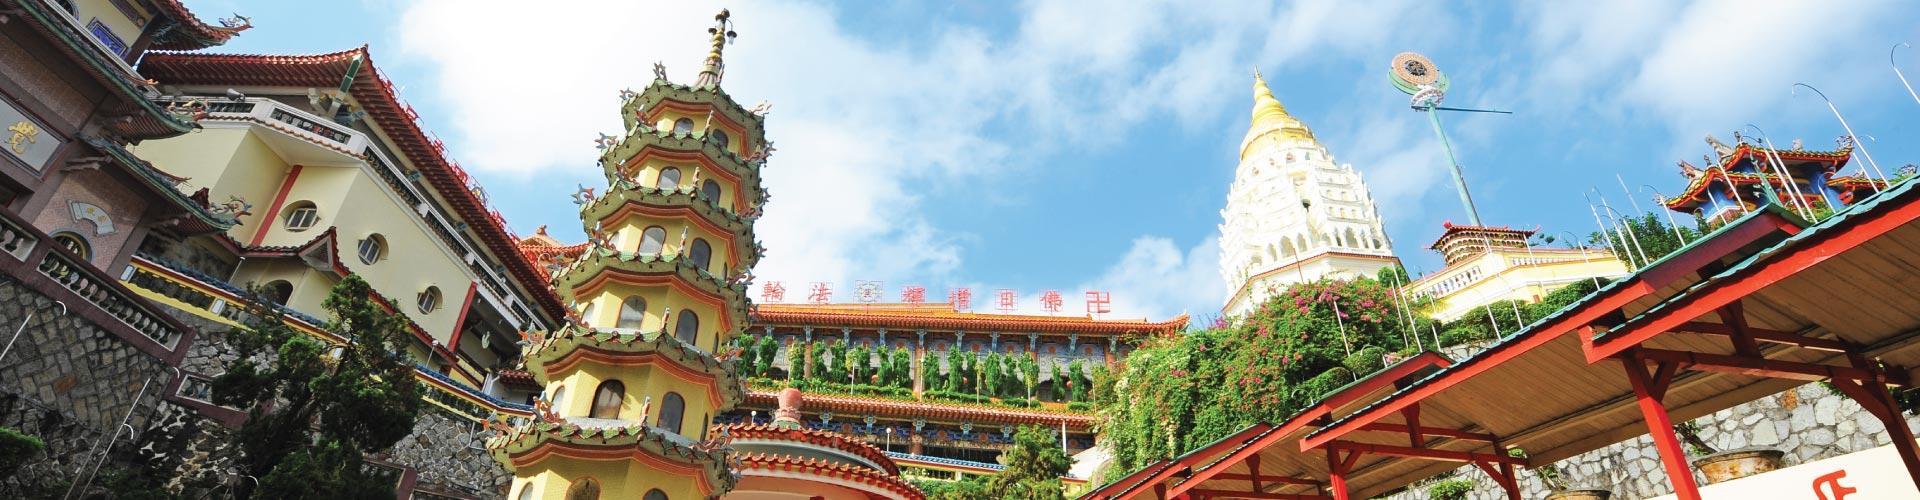 Penang Cruise (Royal Caribbean)